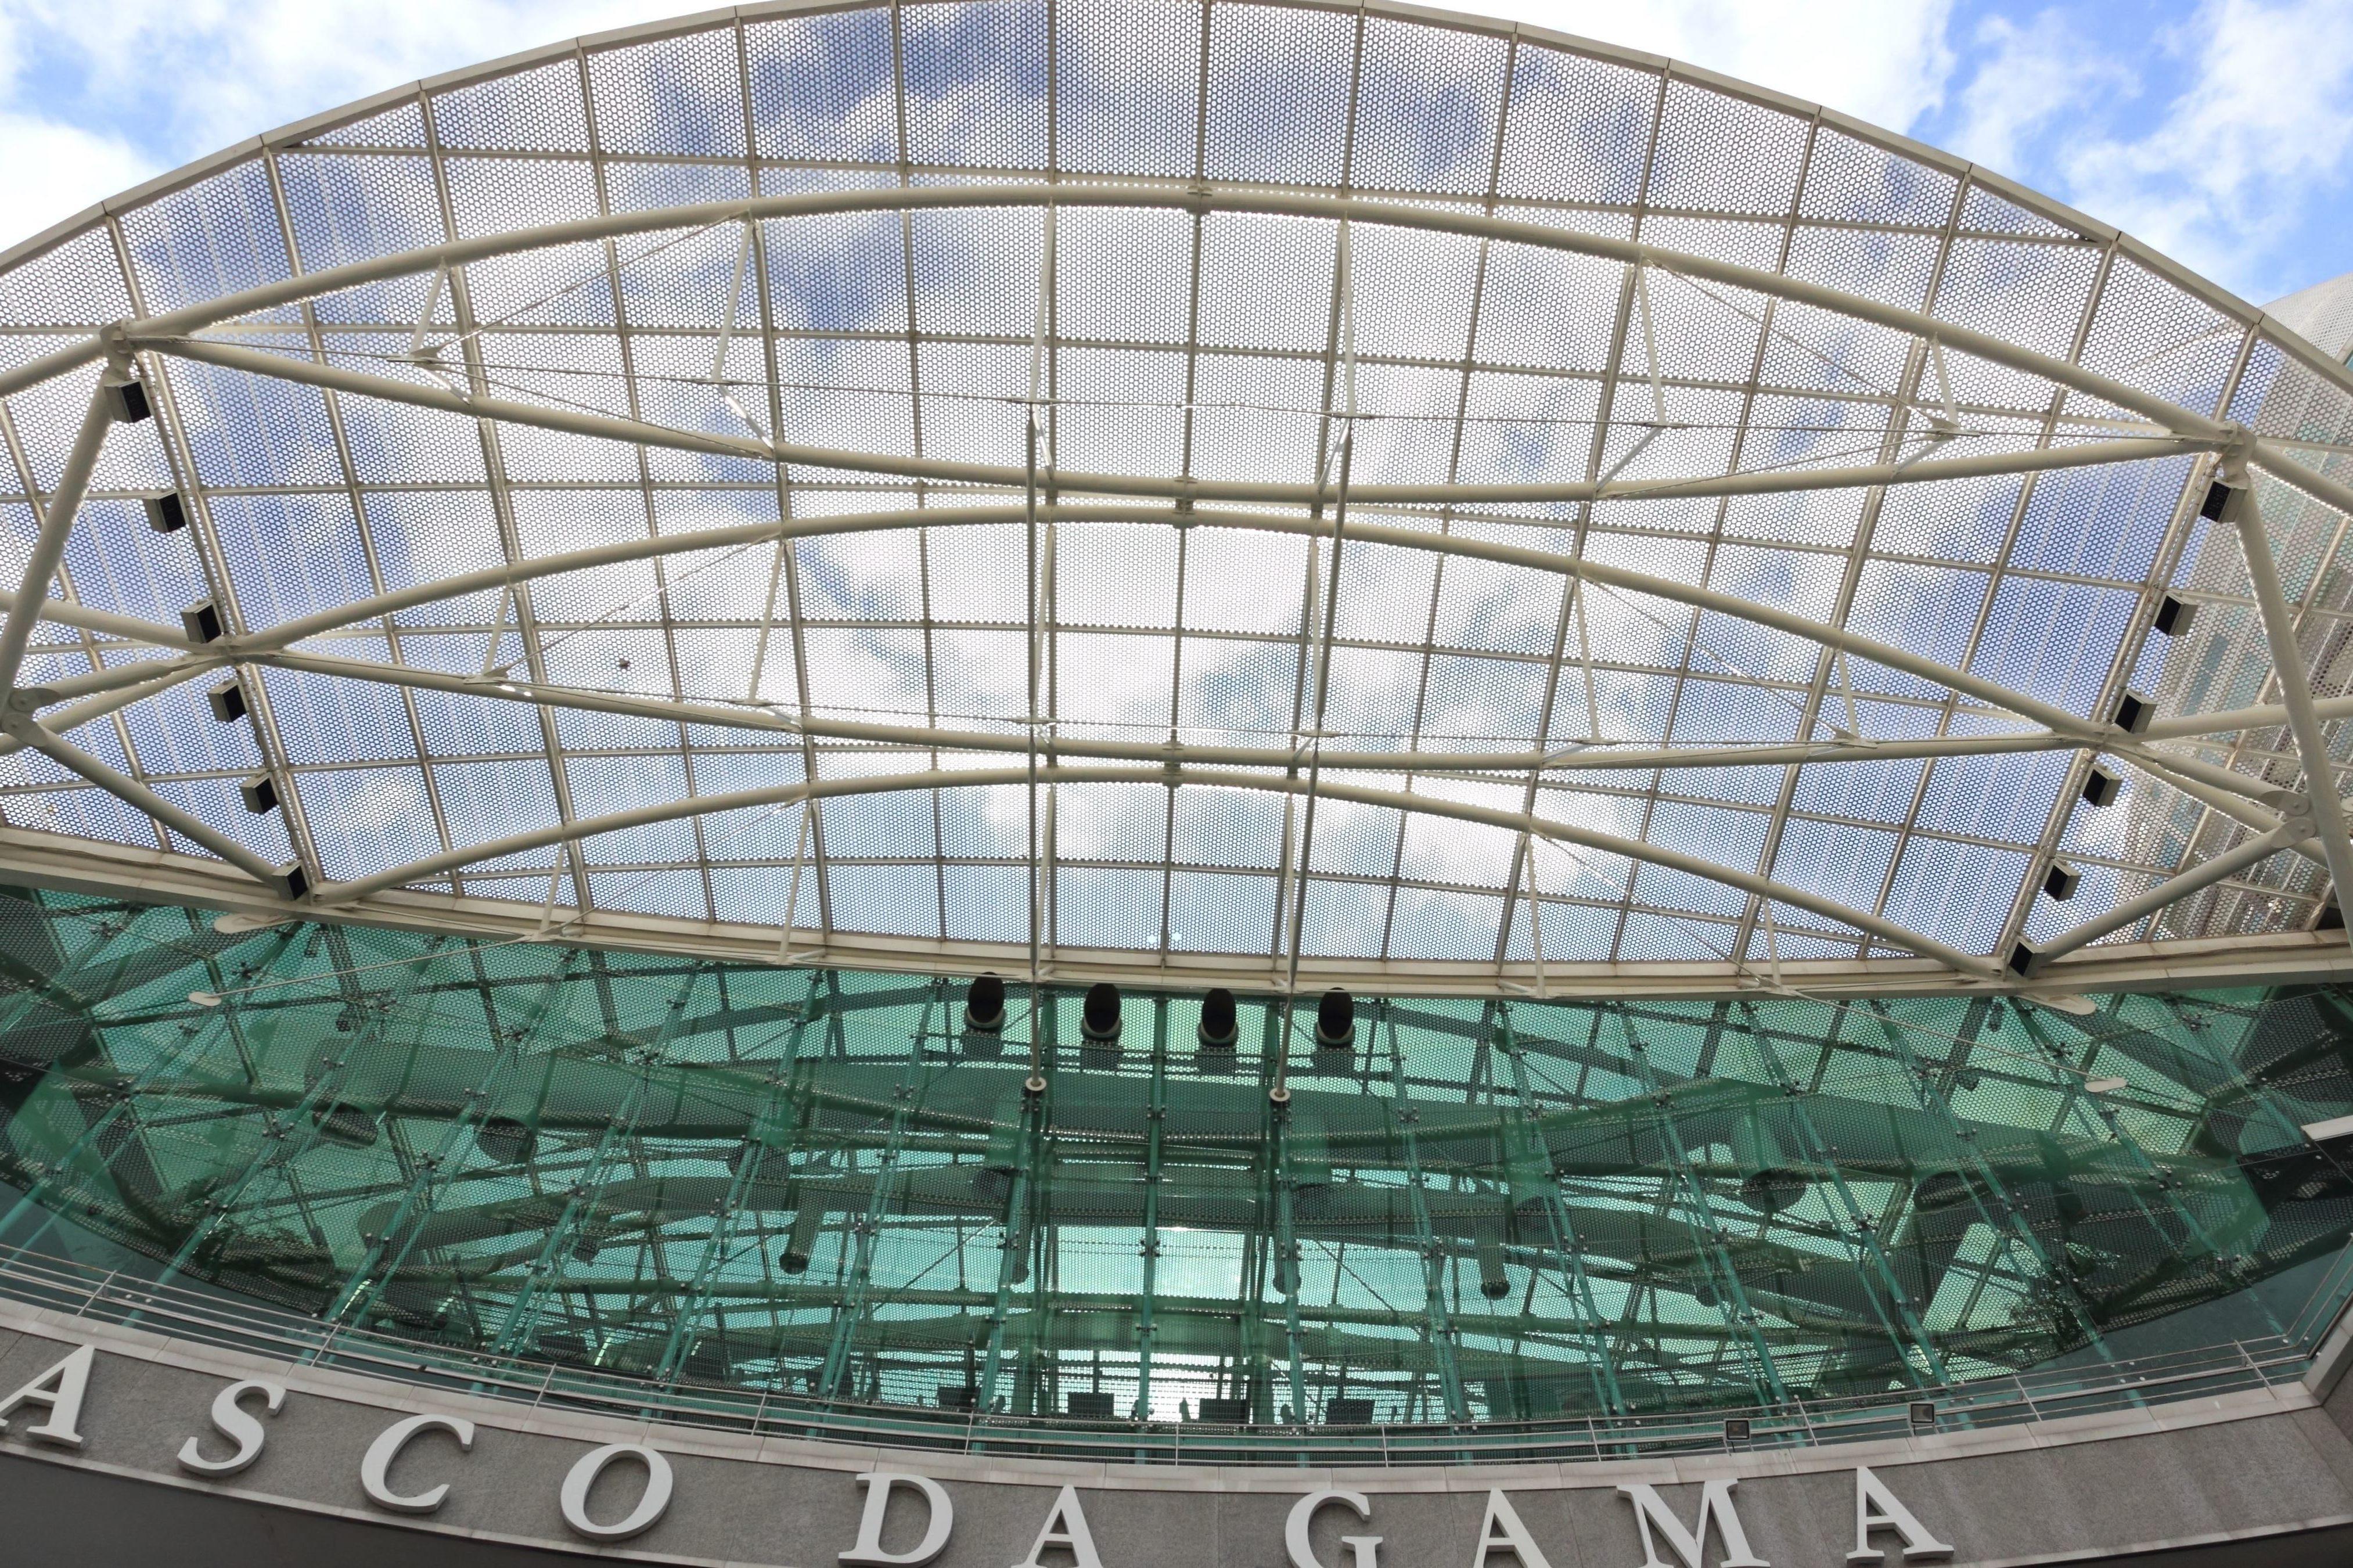 Image libre construction contemporaine fa ade verre for Livres architecture batiment construction